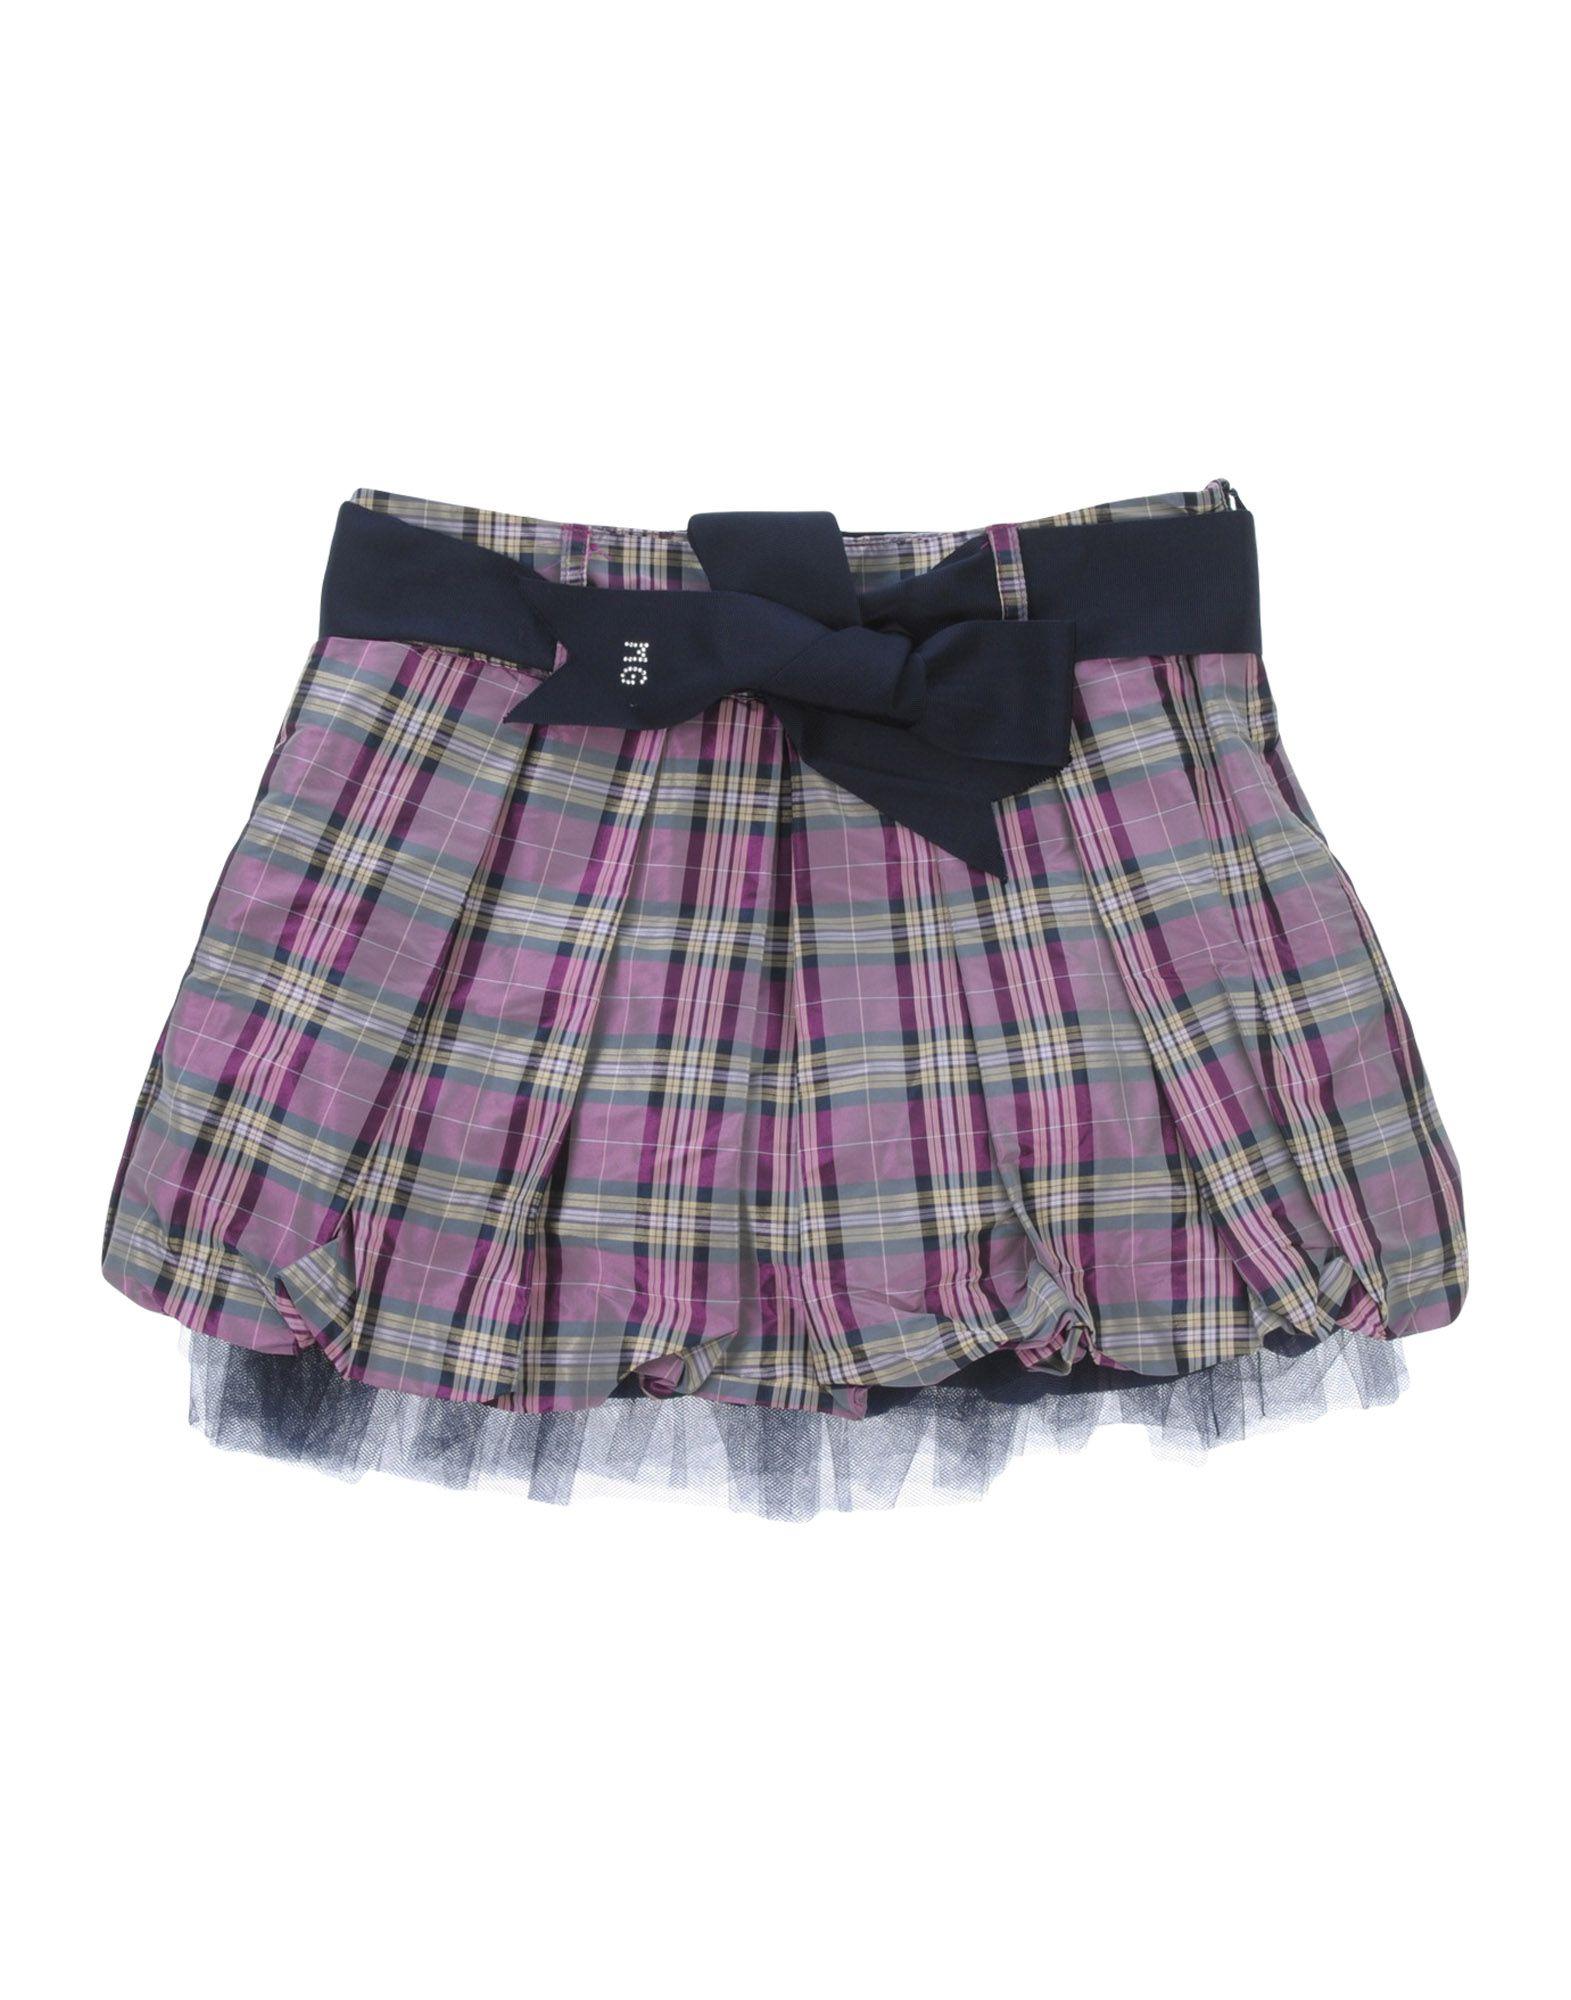 MISS GRANT Юбка юбка шорты miss selfridge miss selfridge mi035ewfgom6